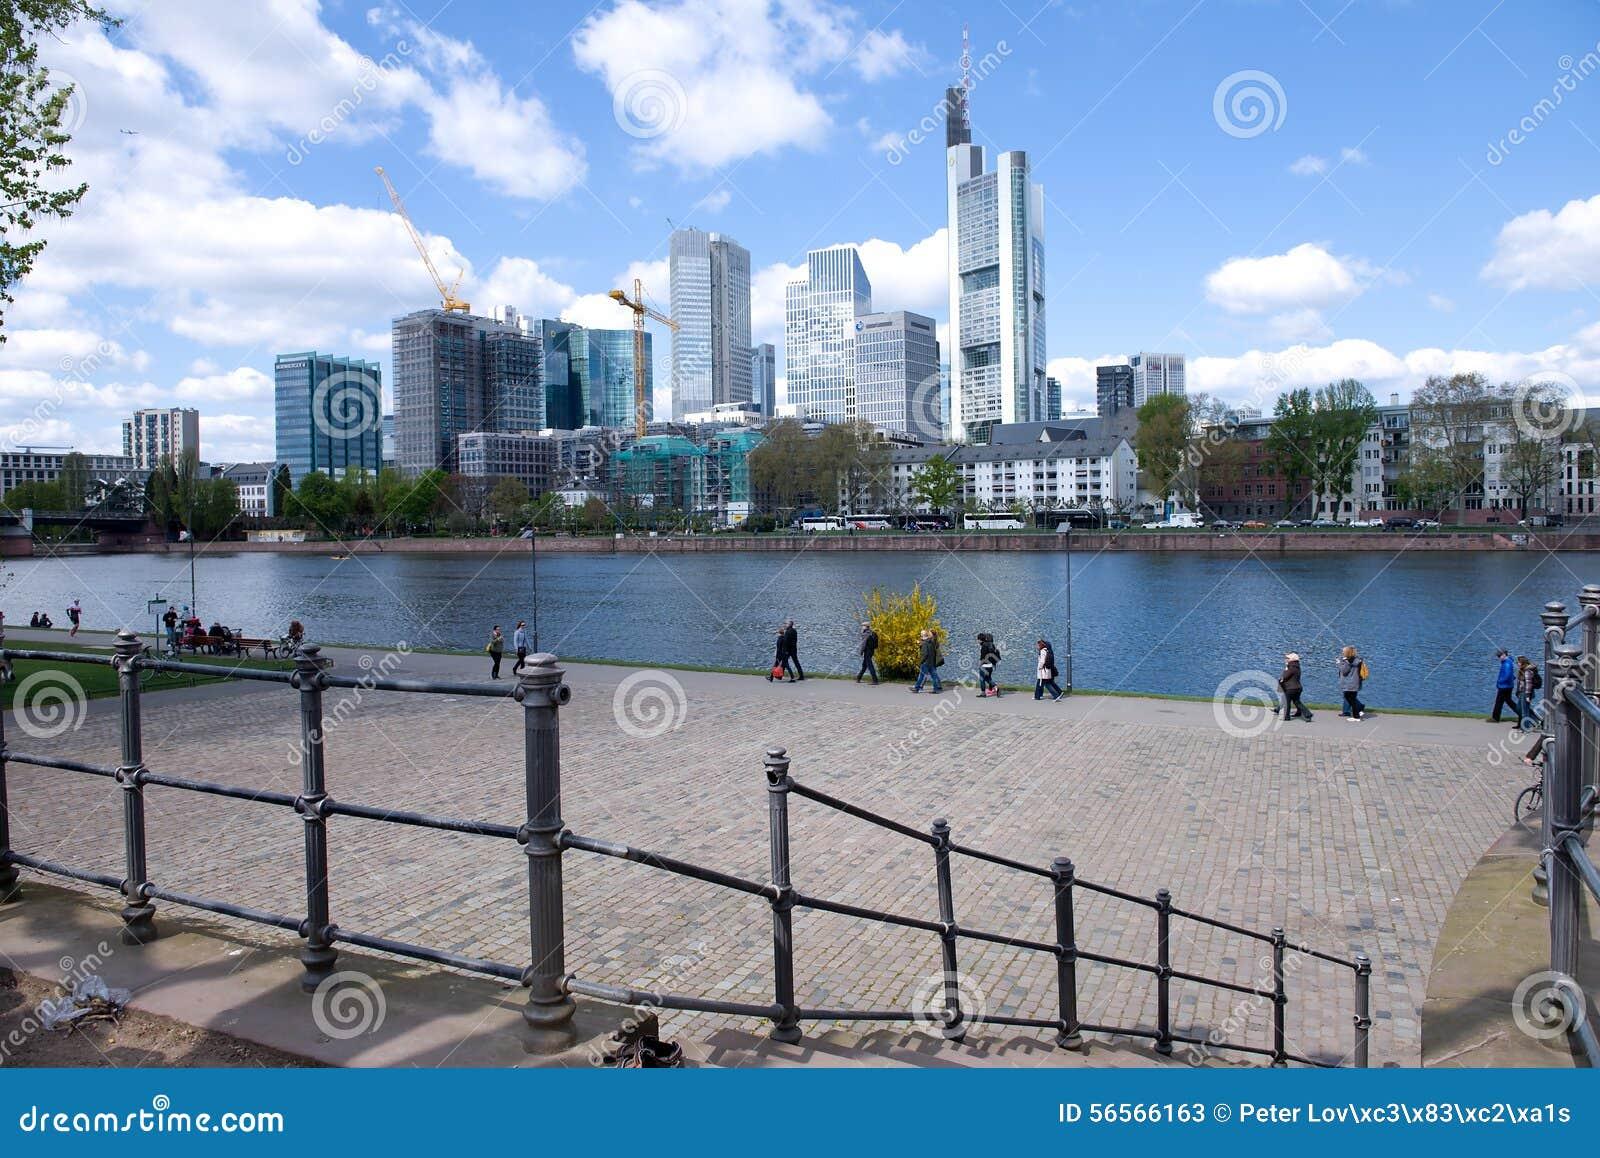 Download Εικονική παράσταση πόλης της Φρανκφούρτης AM Μαίην Εκδοτική Στοκ Εικόνες - εικόνα από βασικός, ημέρα: 56566163